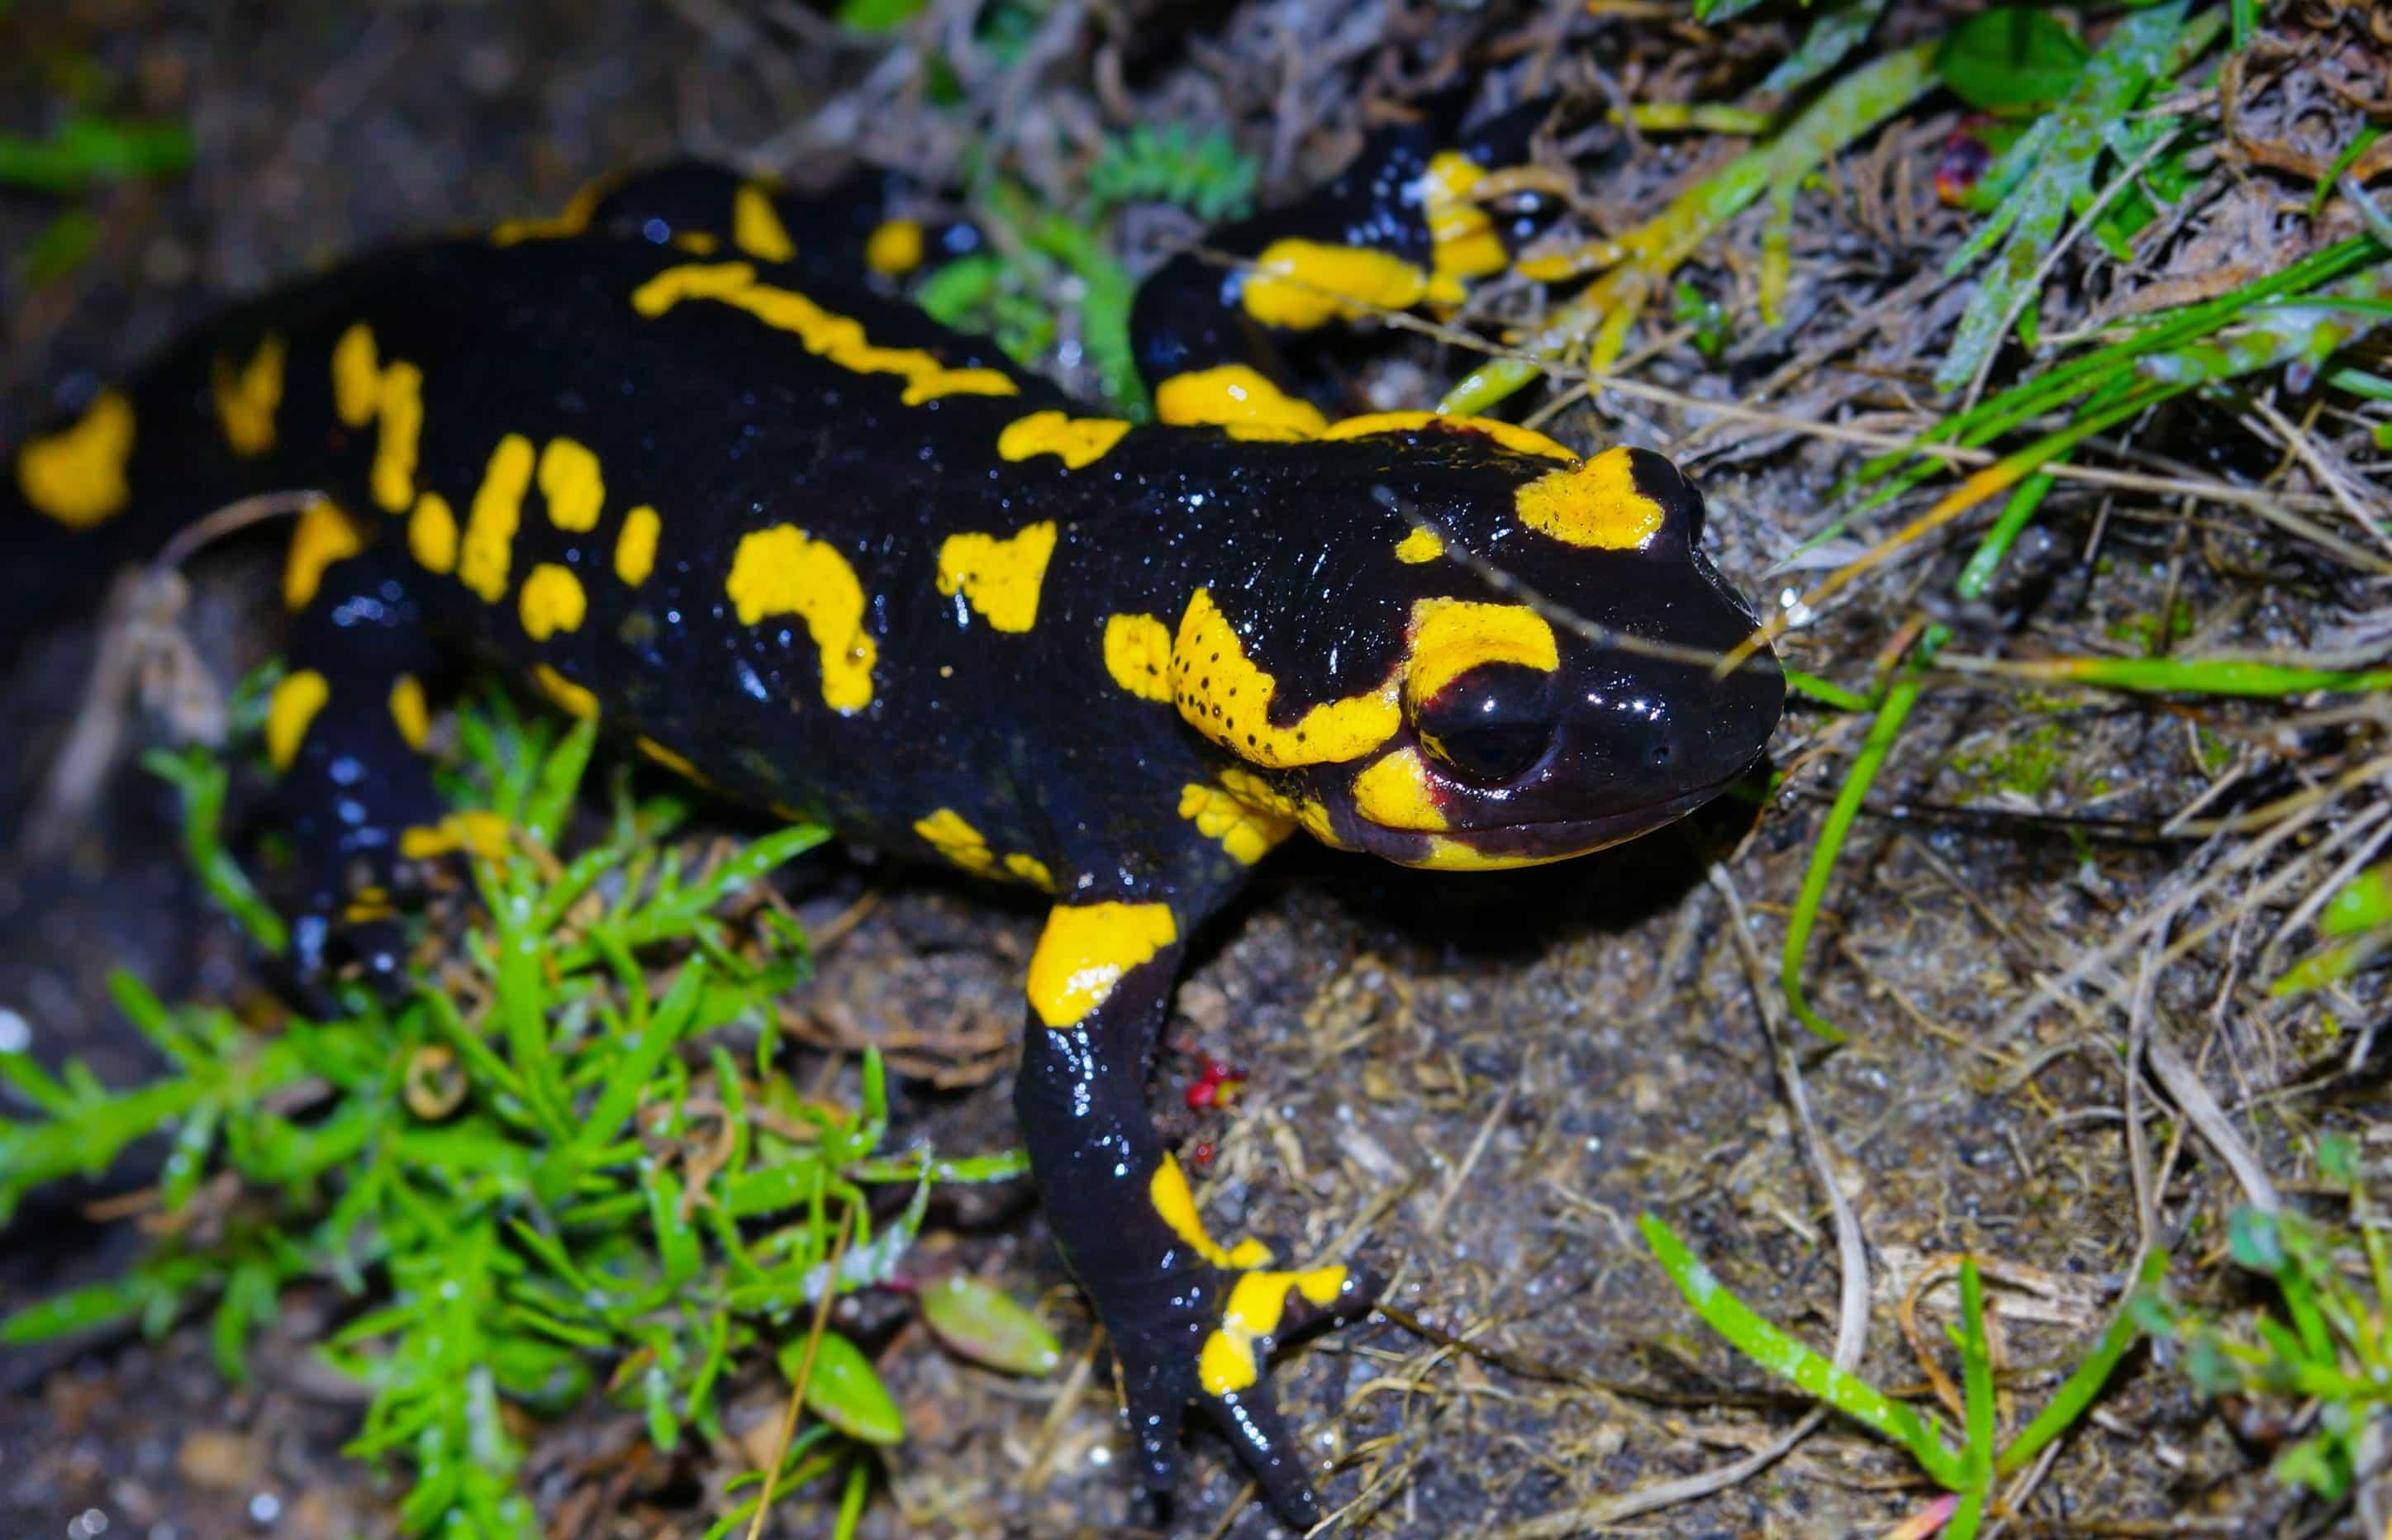 free picture colorful salamander wildlife amphibian nature